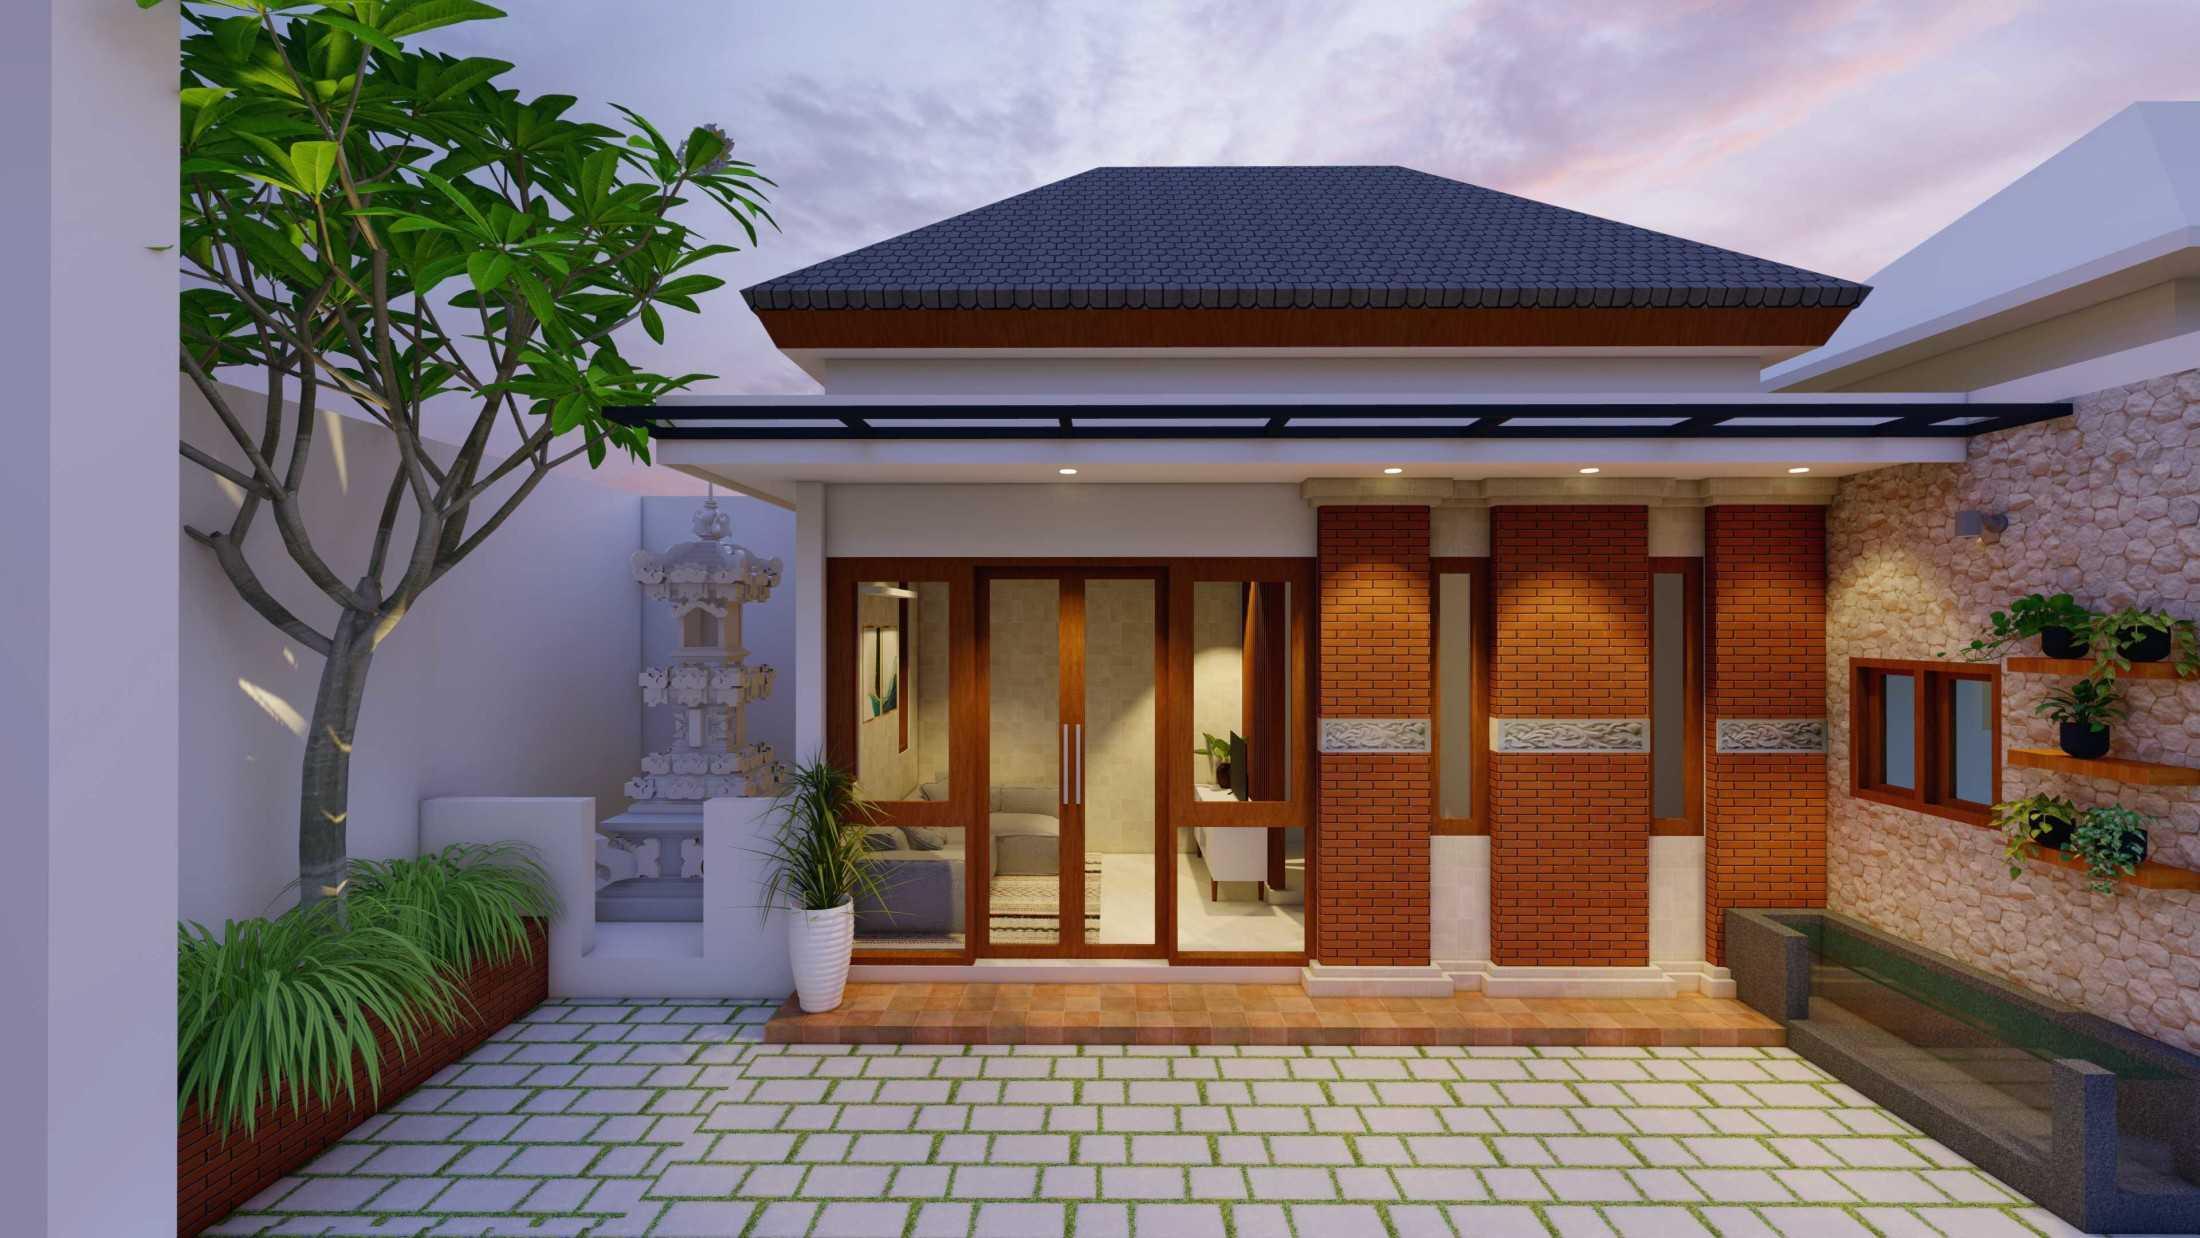 Dnaprojectbali Renovation Facade House And Living Ceroring Kota Denpasar, Bali, Indonesia Kota Denpasar, Bali, Indonesia Dnaprojectbali-Renovation-Facade-House-And-Living-Ceroring  132543